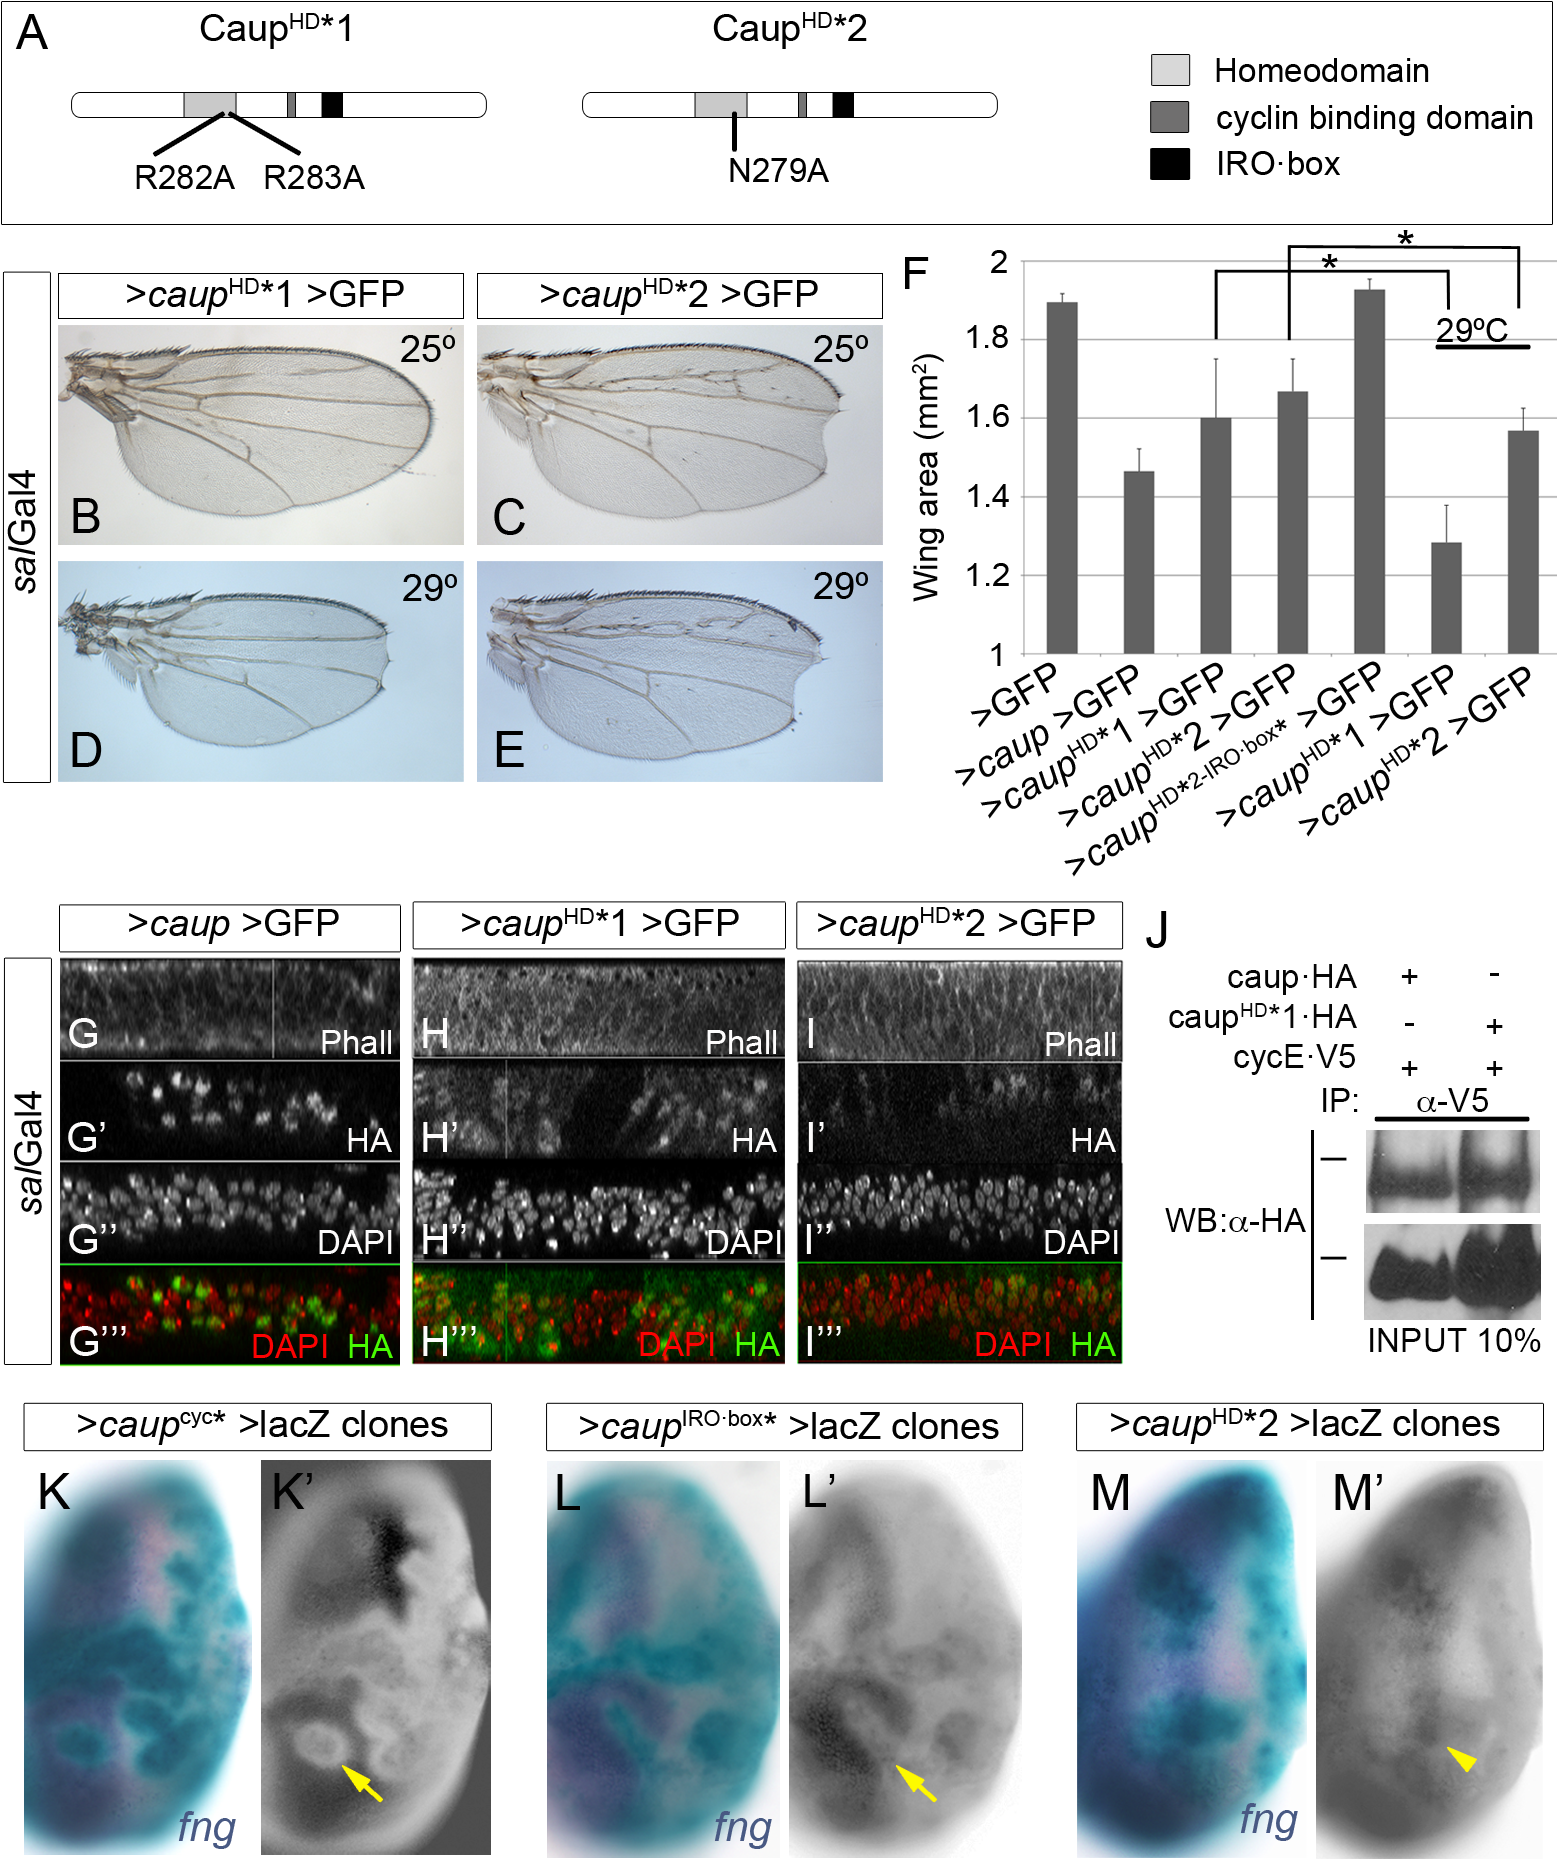 Functional analysis of homeodomain-mutant Caup proteins.